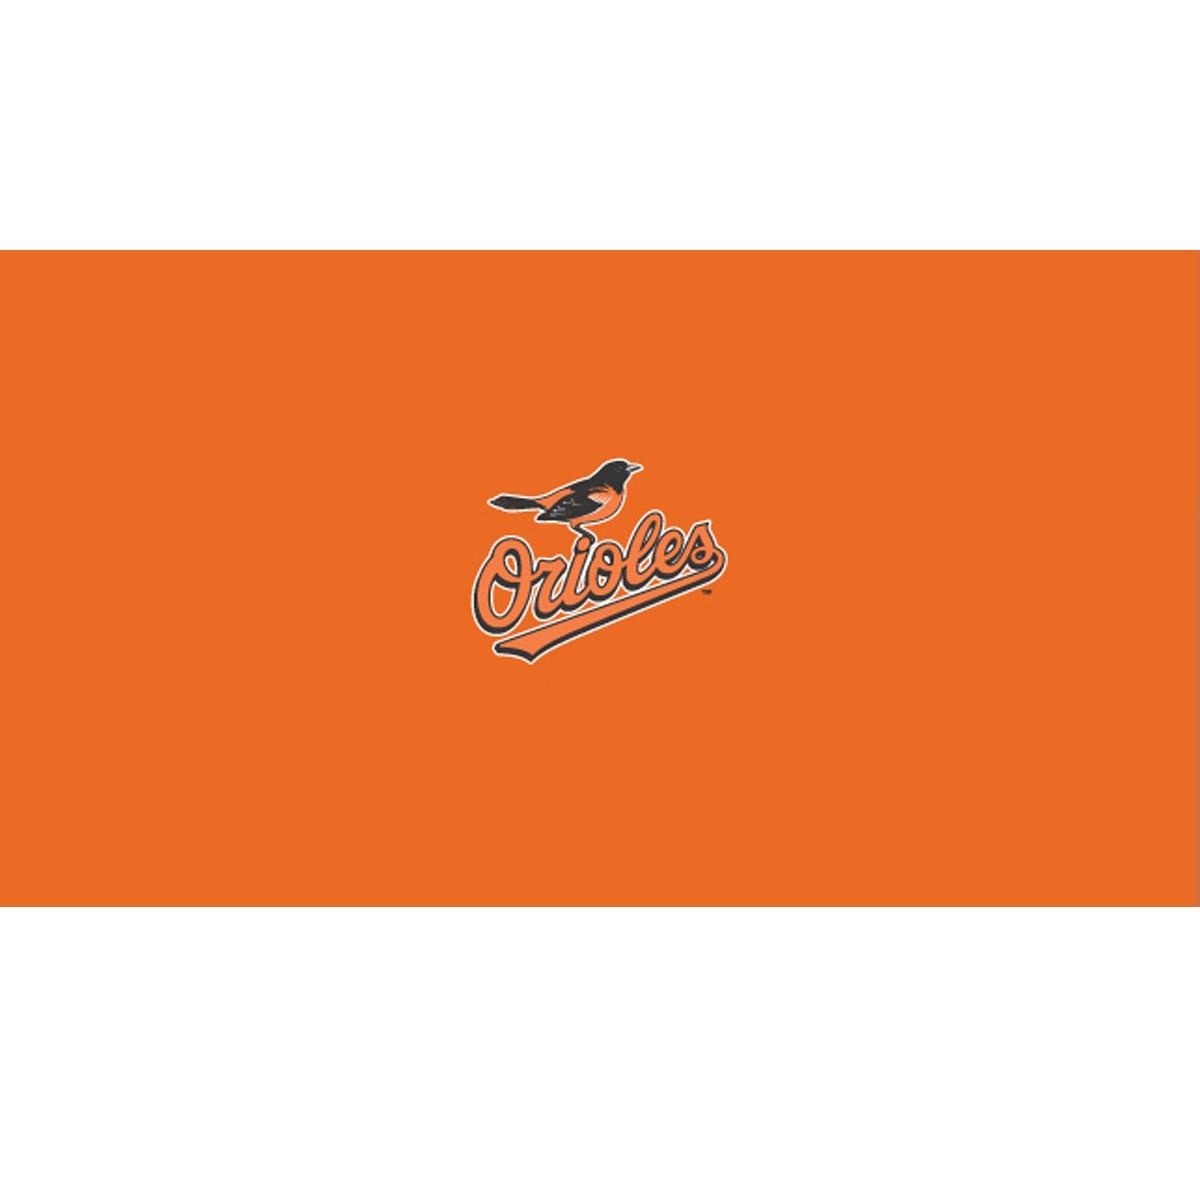 BALTIMORE ORIOLES 8-FOOT BILLIARD CLOTH